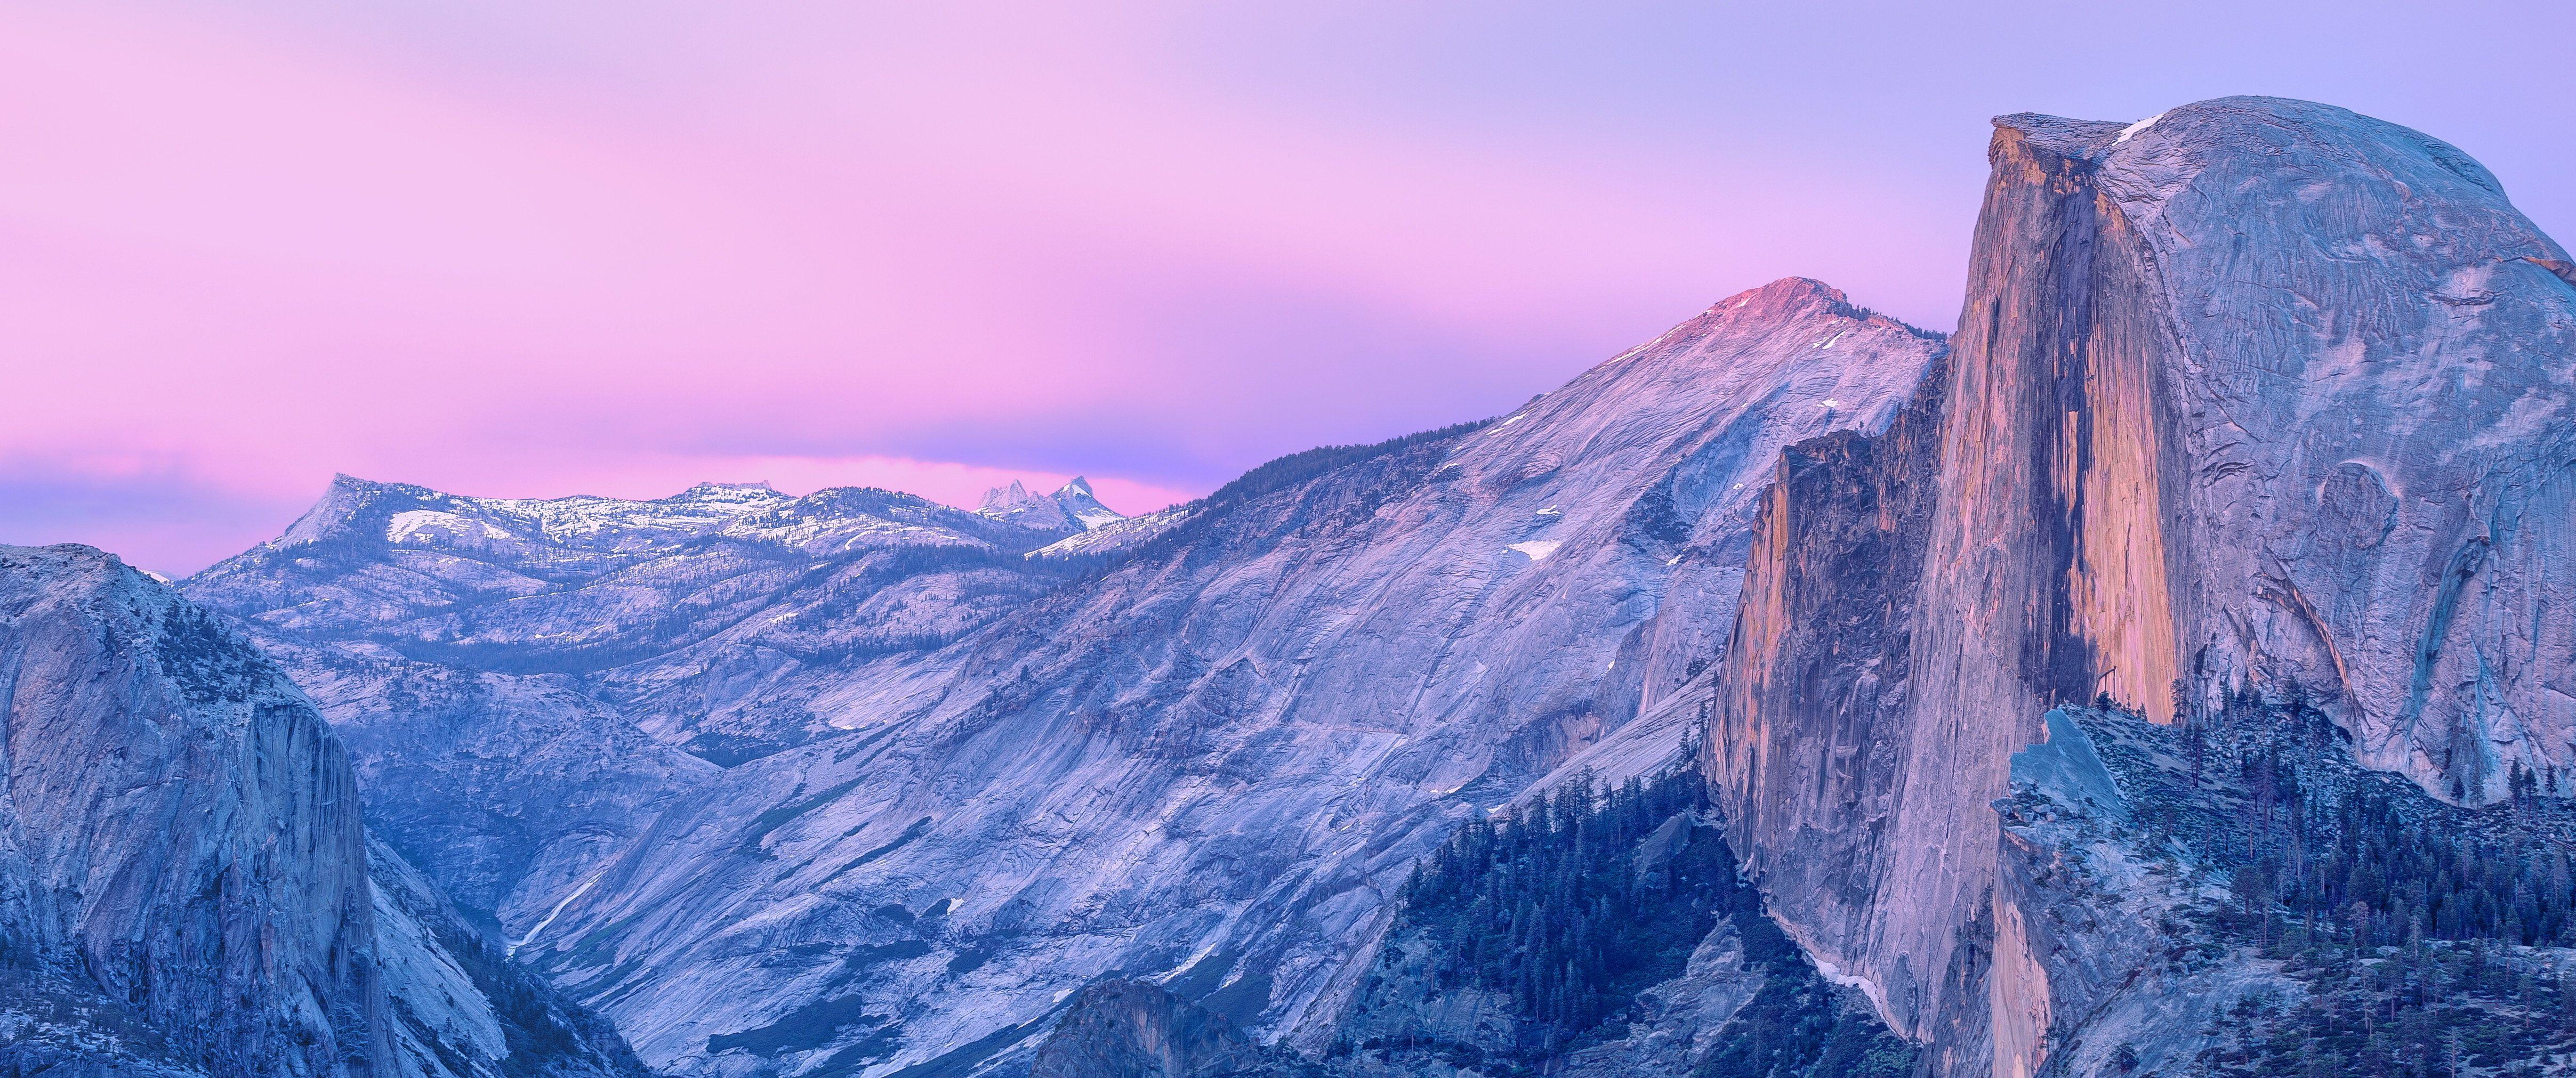 150 Hd Nature Only Wallpapers Yosemite Wallpaper Ipad Air Wallpaper Mountain Wallpaper